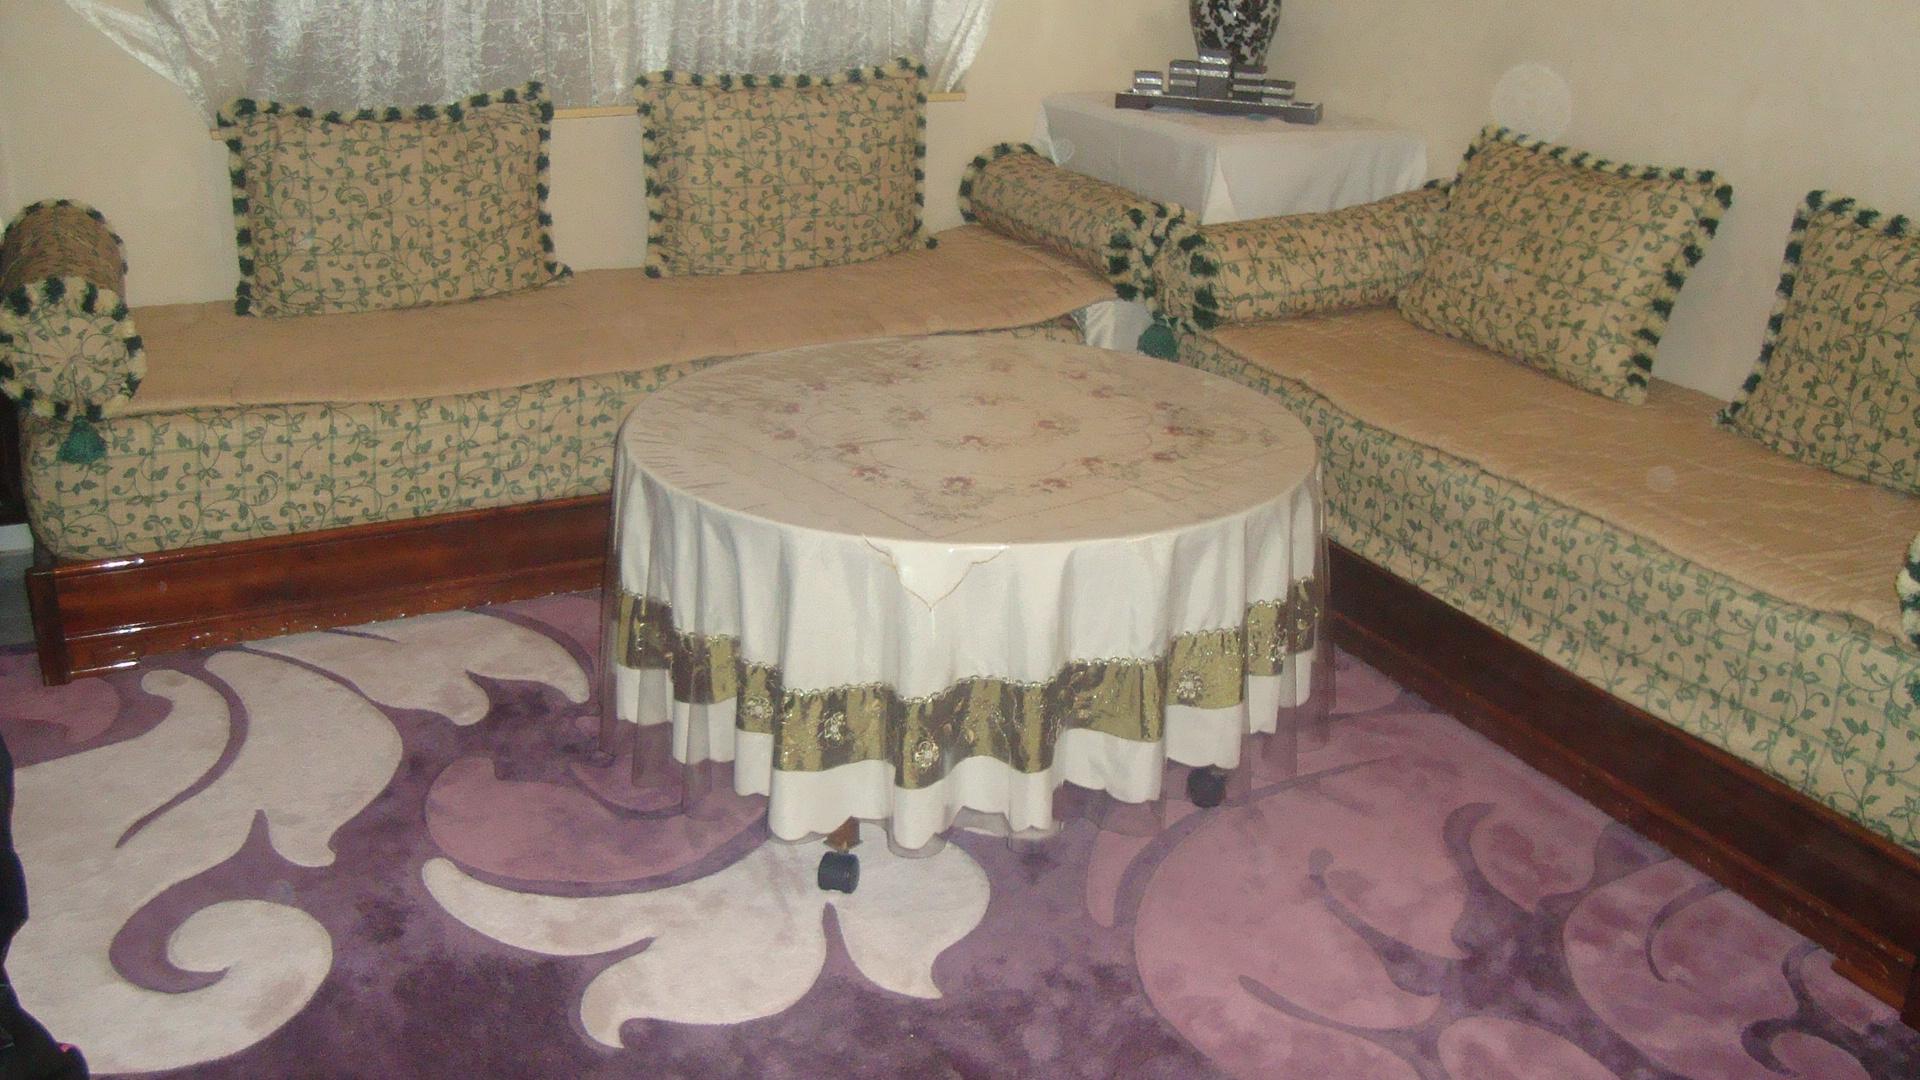 vend salon marocain prix 800 poissy france. Black Bedroom Furniture Sets. Home Design Ideas